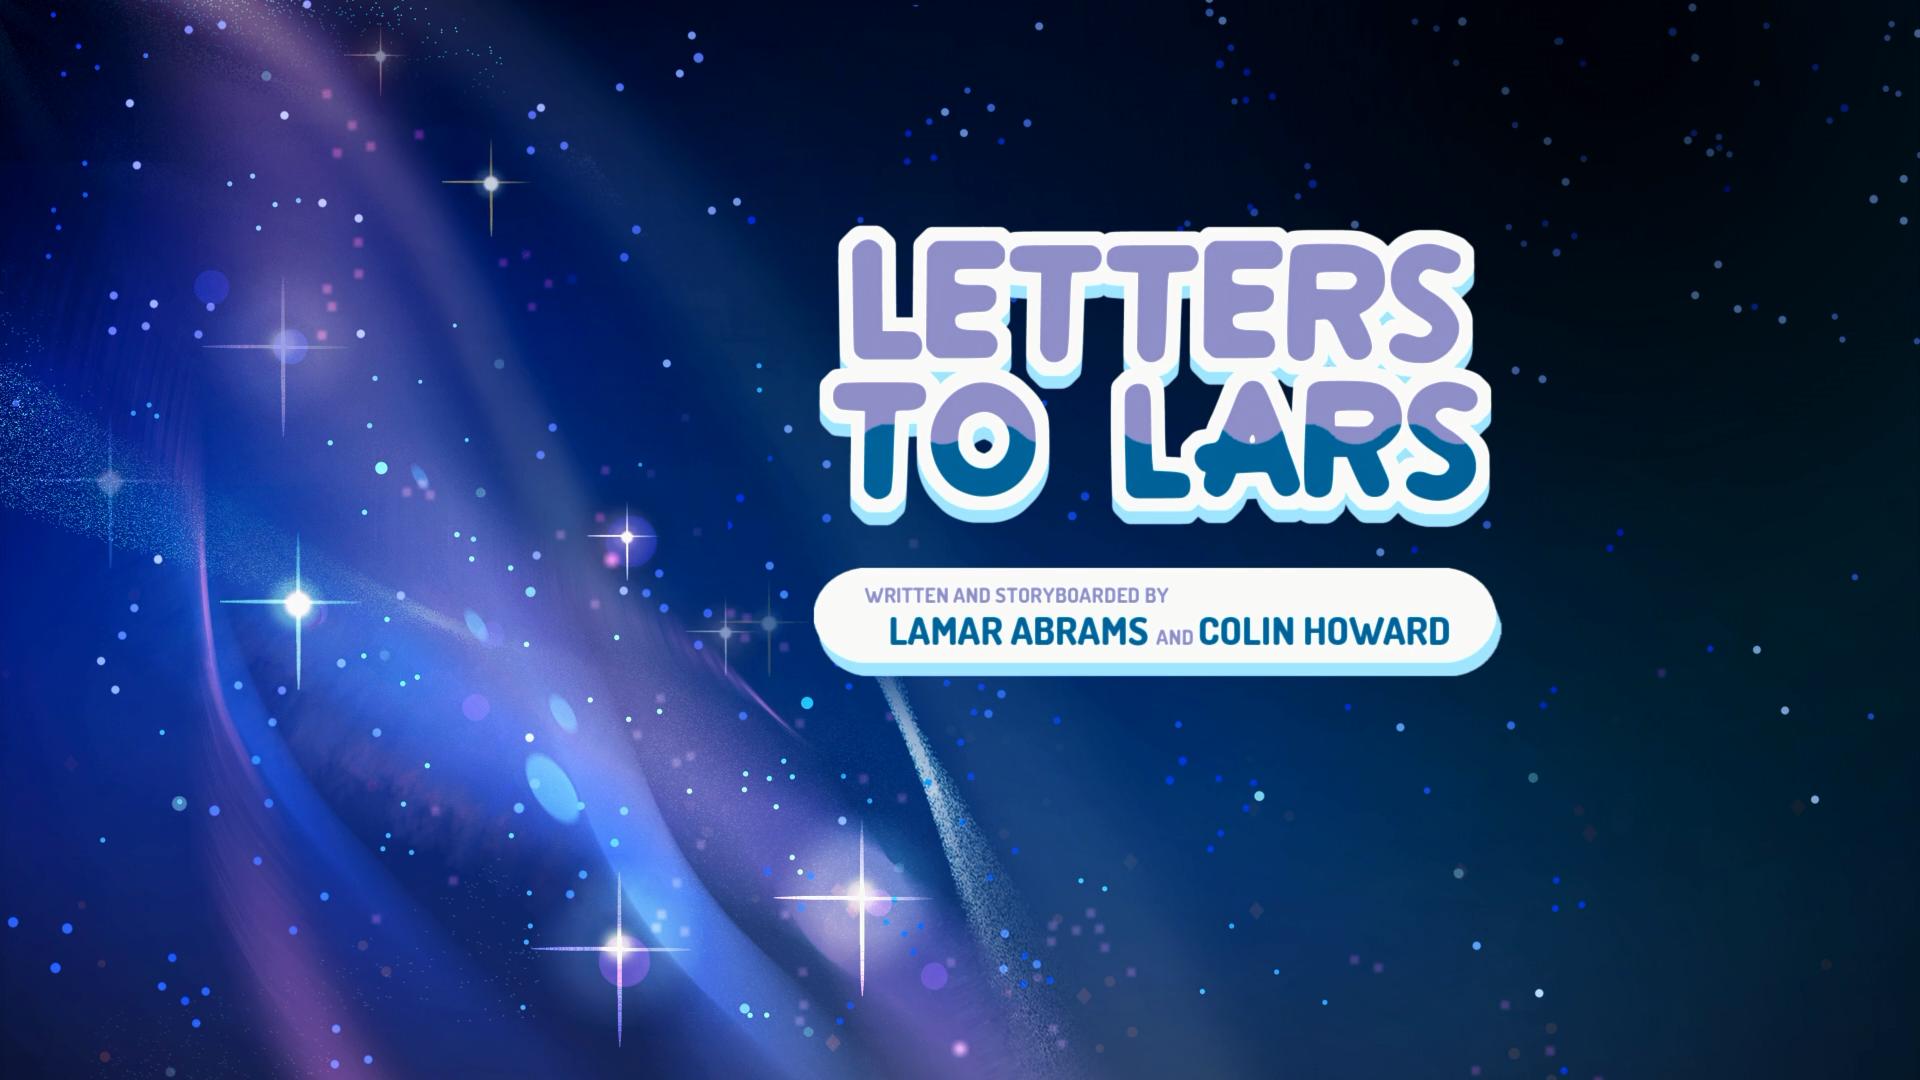 Letters to Lars | Steven Universe Wiki | FANDOM powered by Wikia